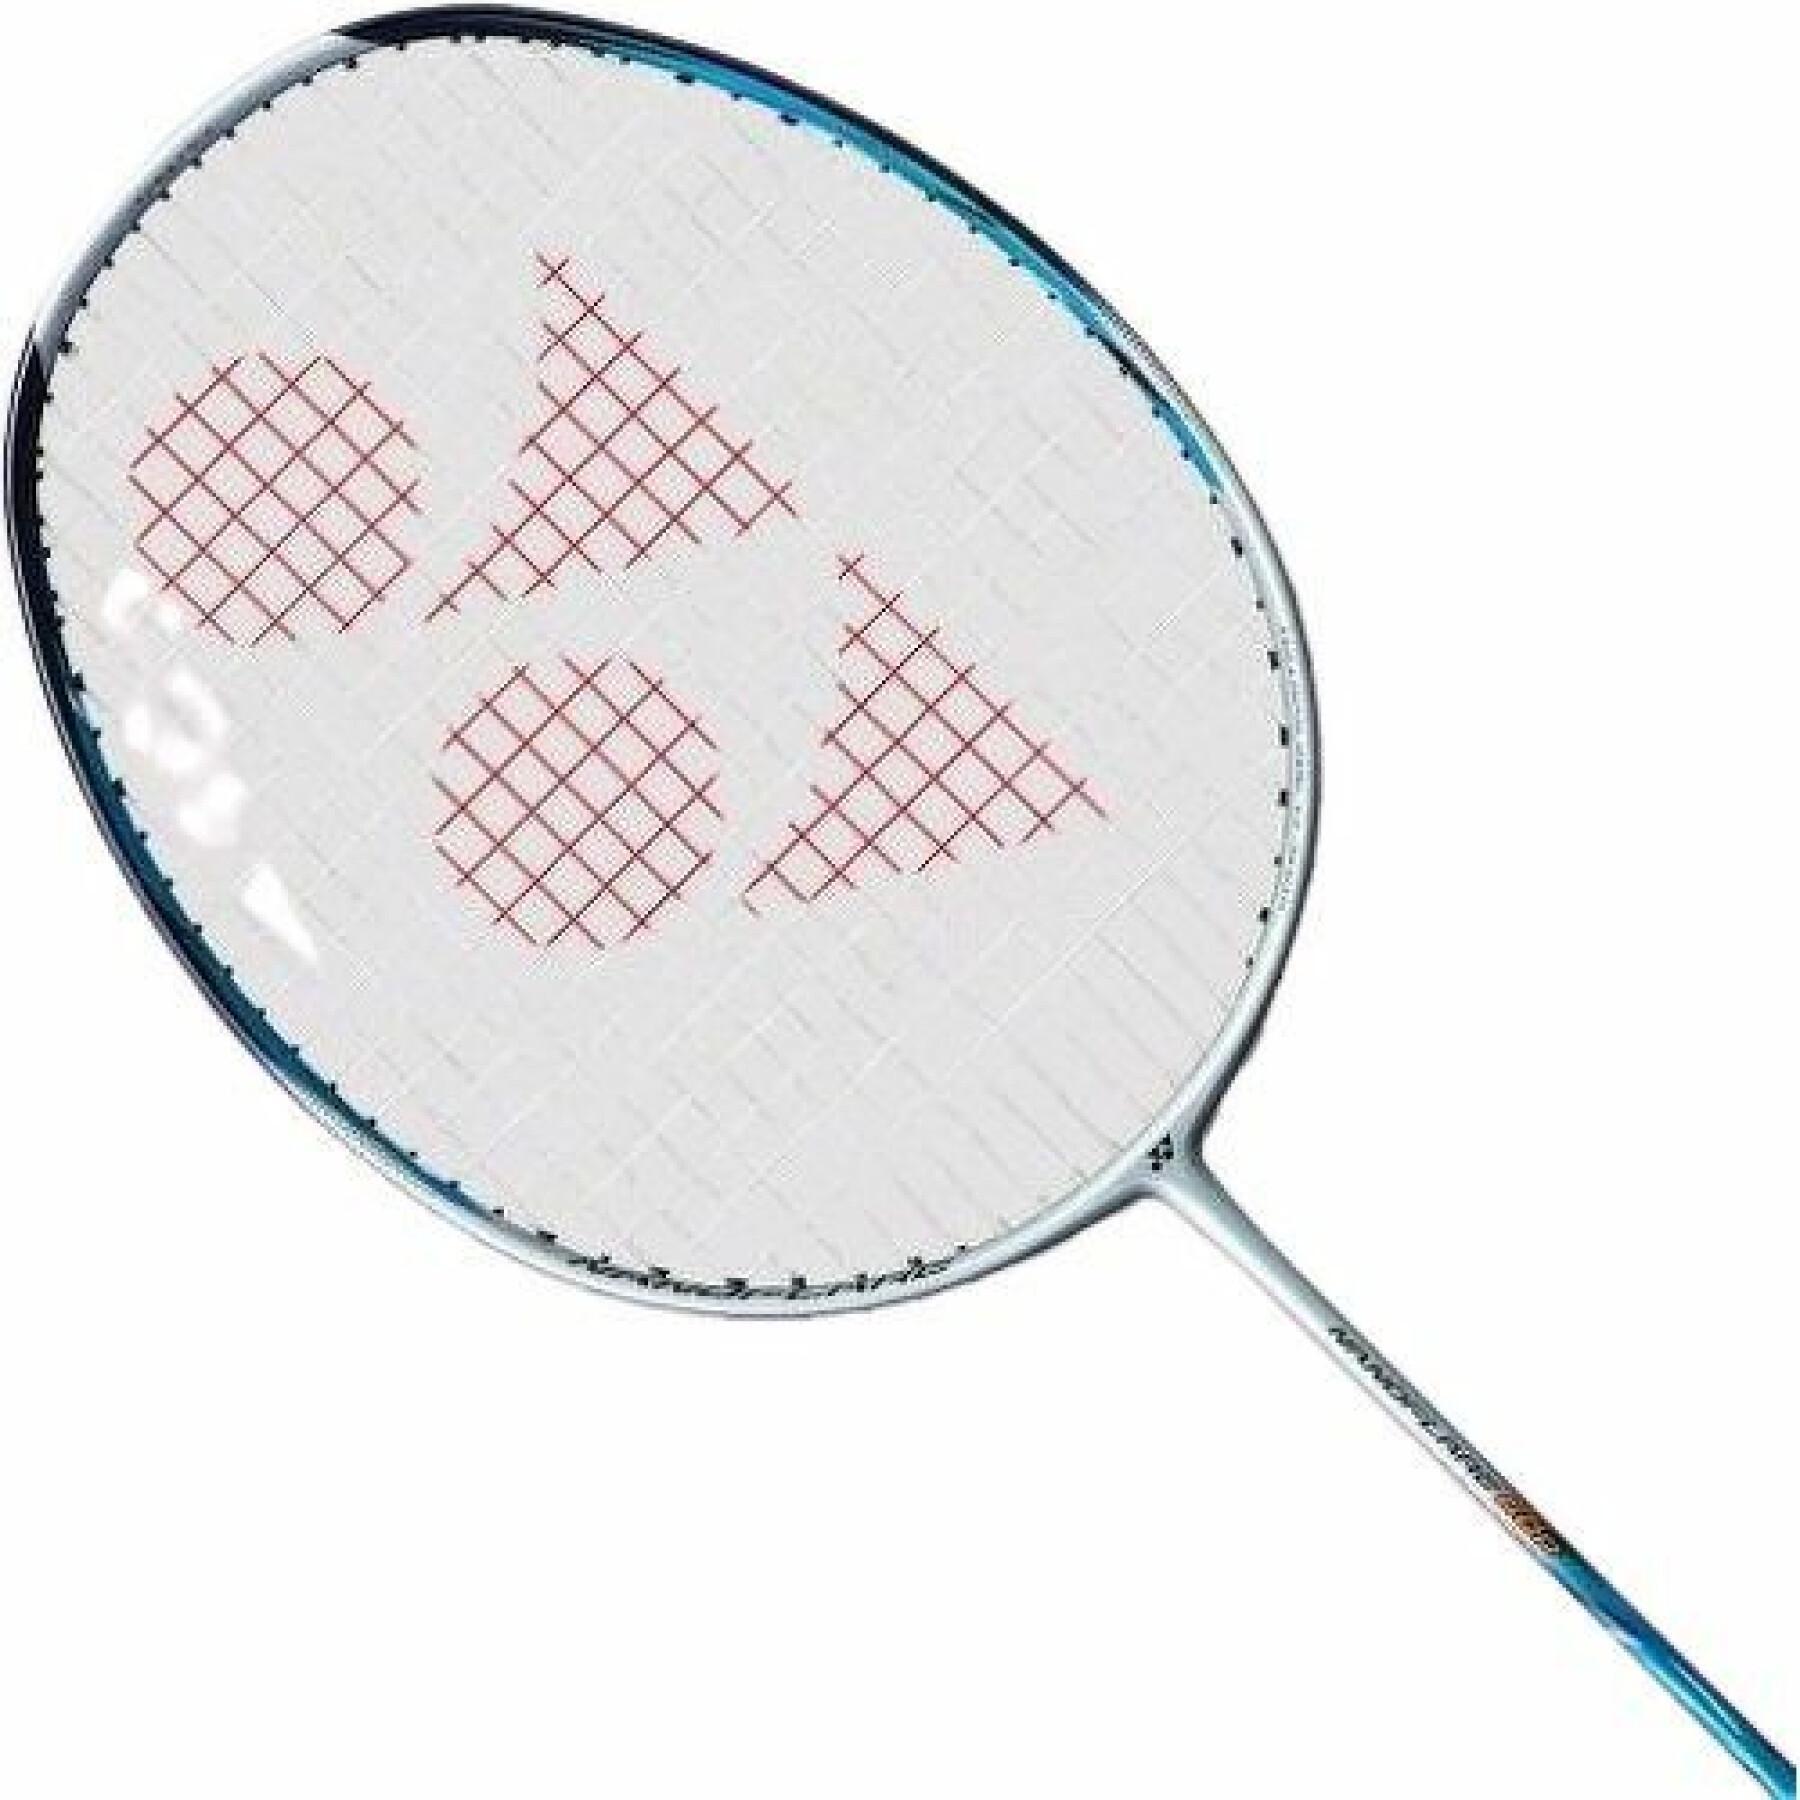 Yonex Nanoflare 600 Racquets